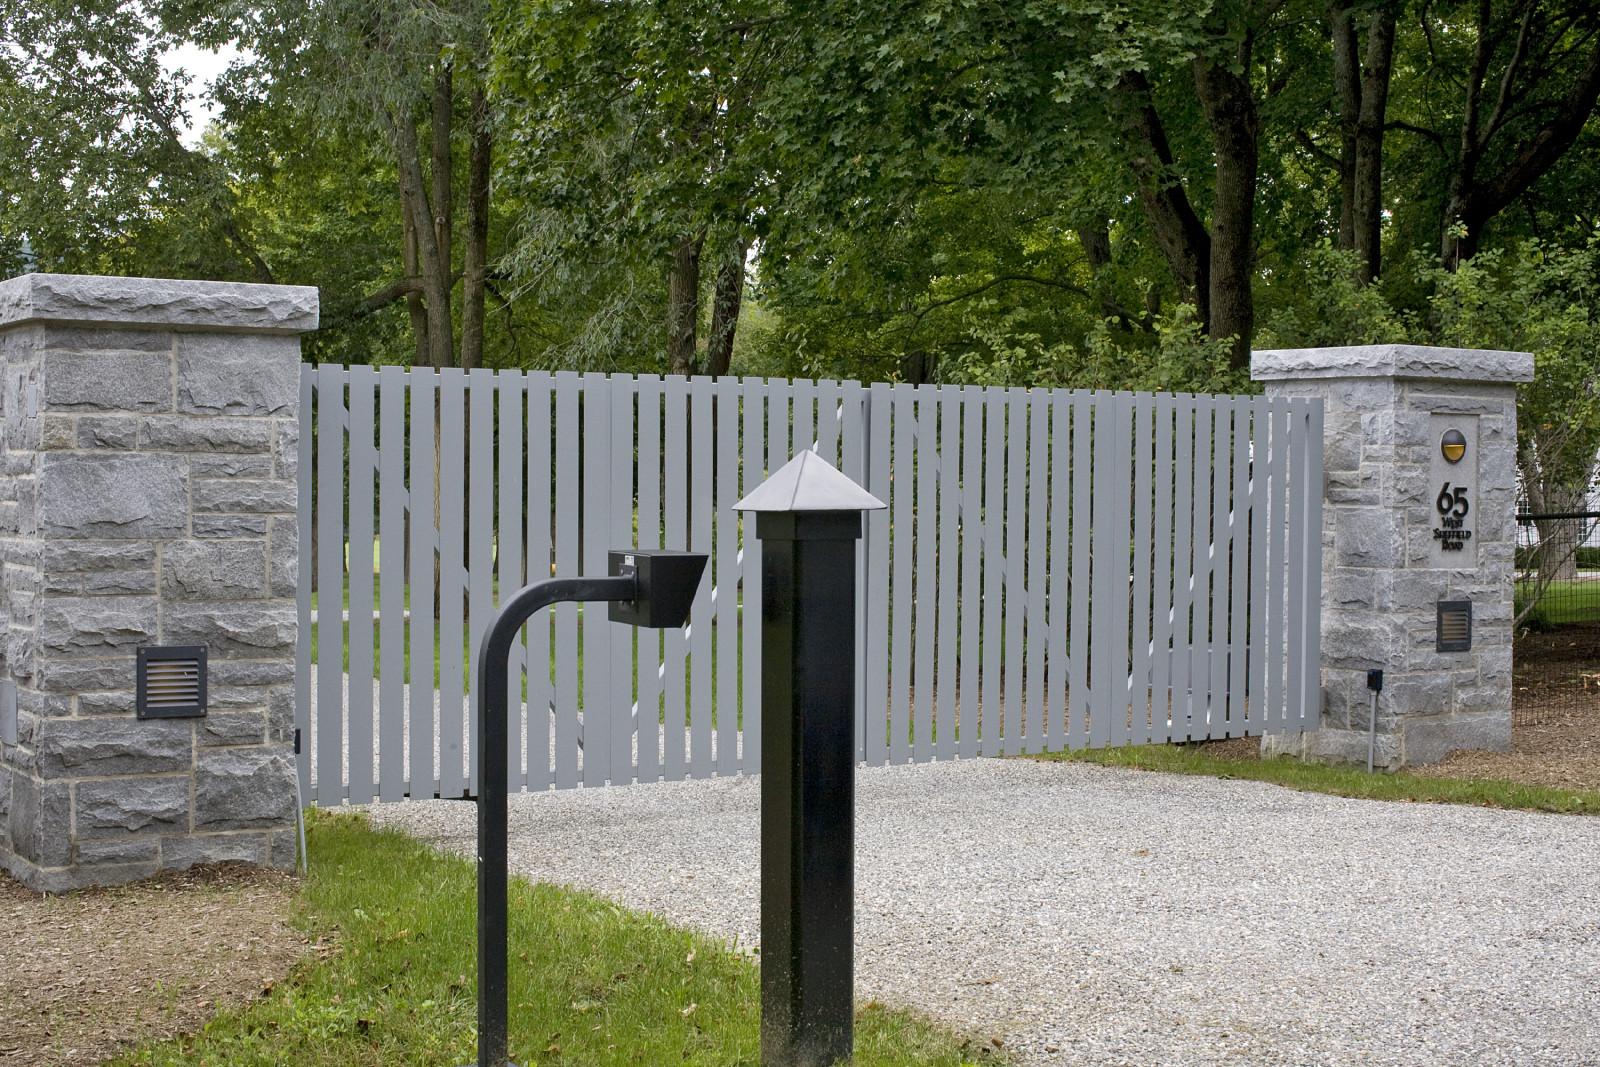 South  Berkshires – Modern entry estate gate